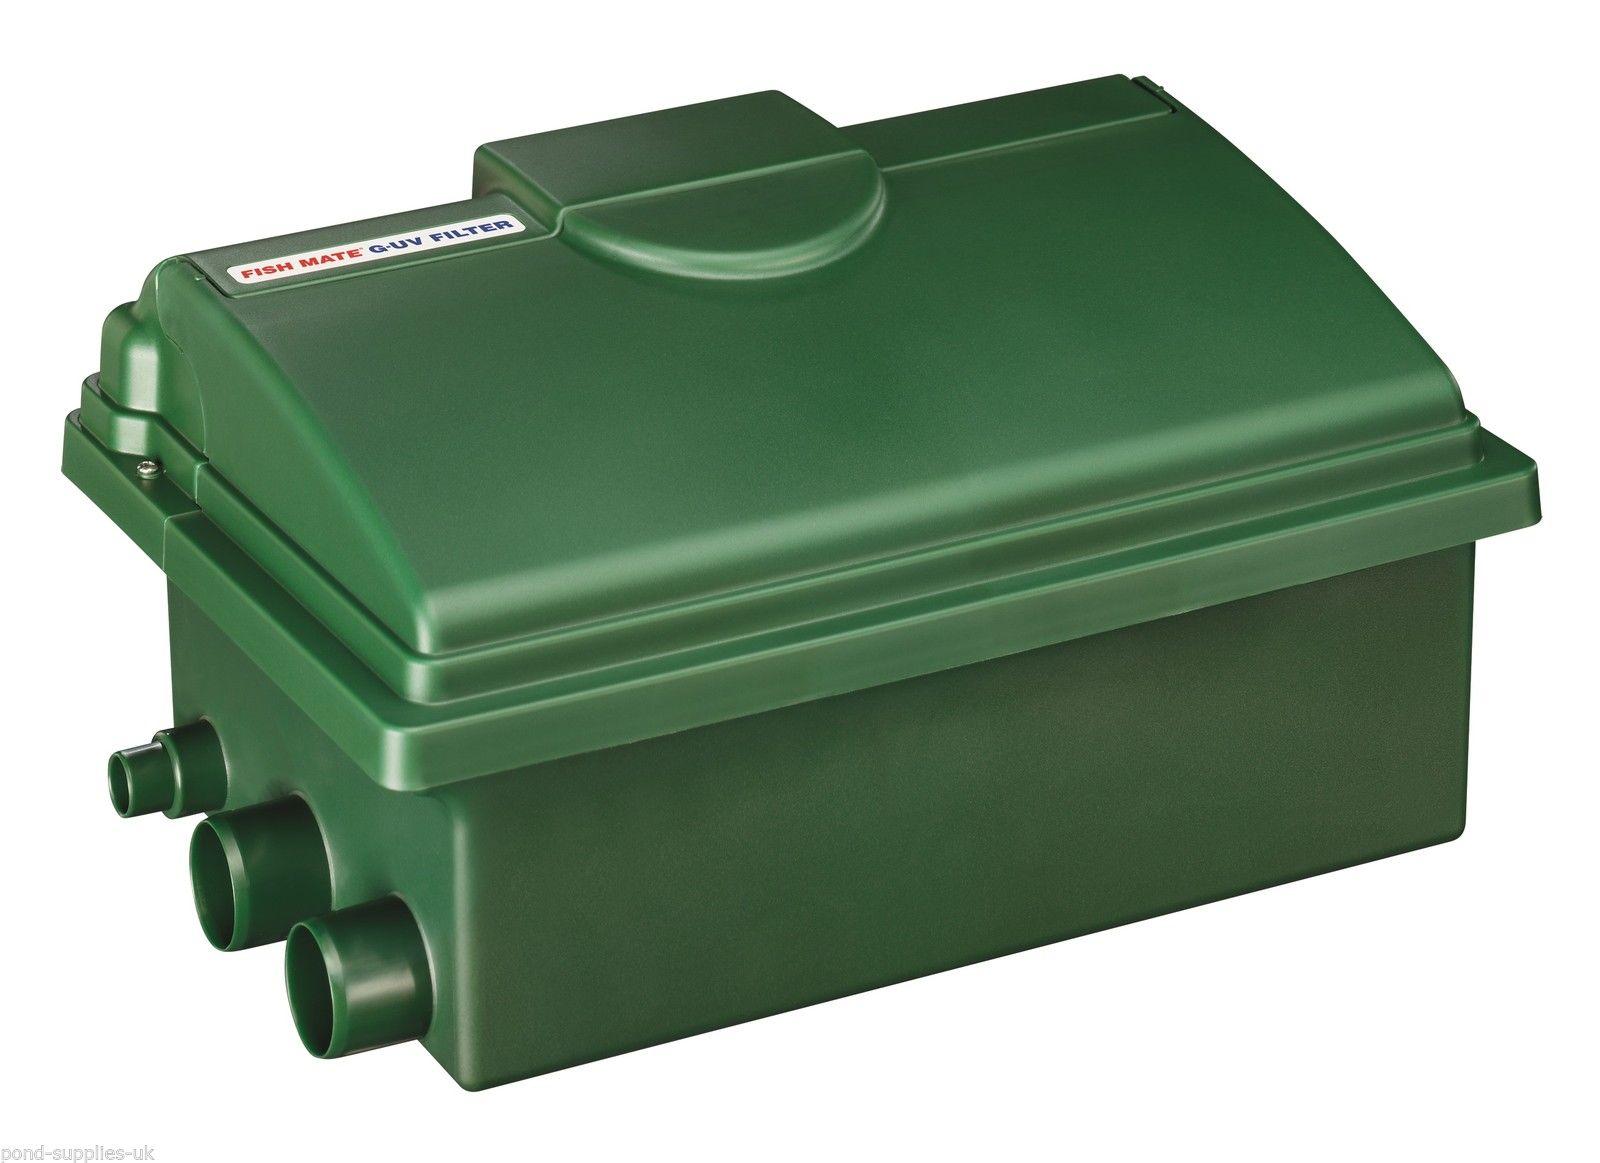 Fish mate 4000 guv 8w uv bio media gravity filter box fish for Koi pond pool filter